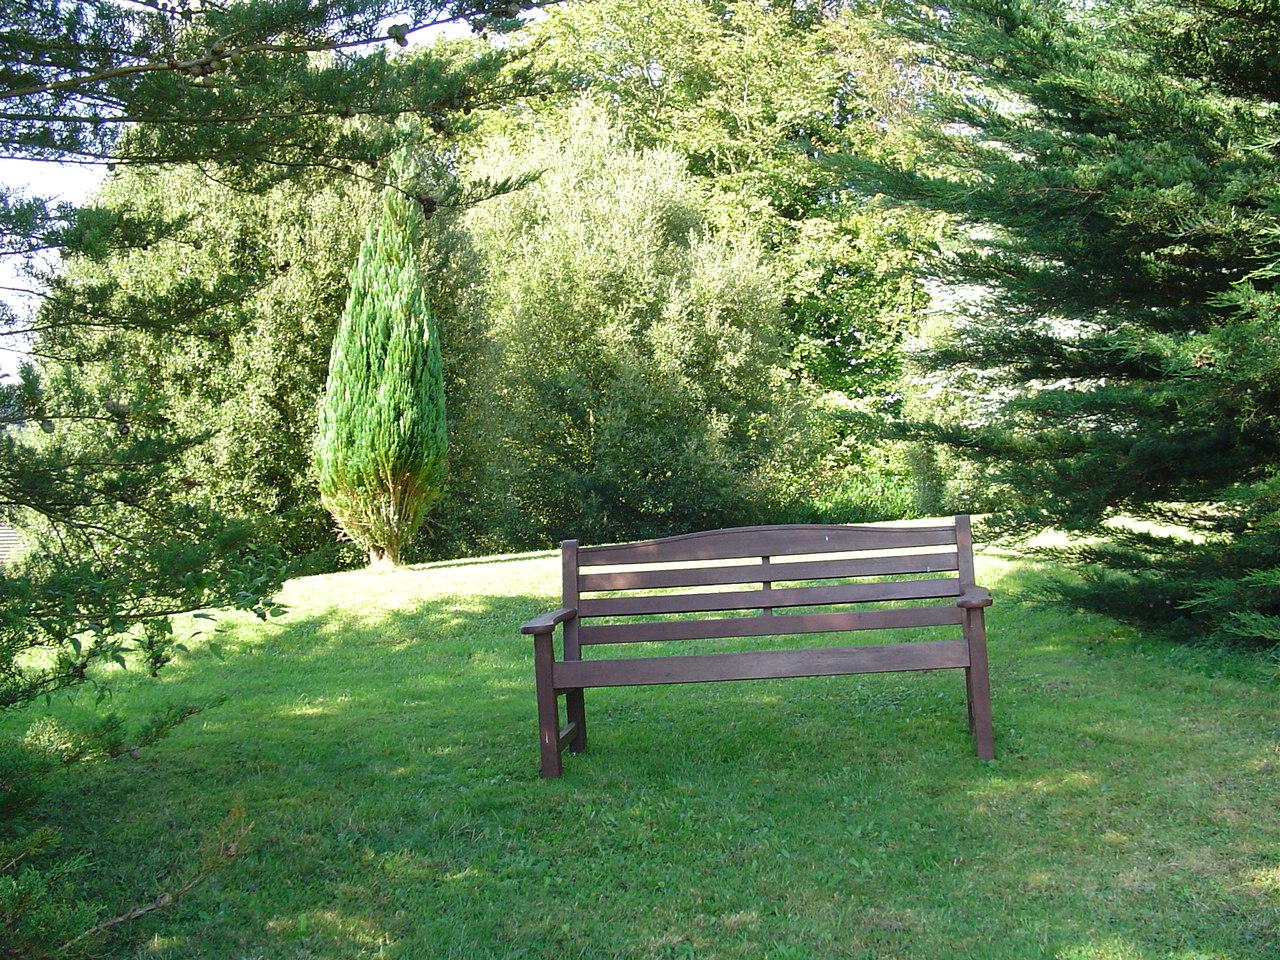 gardenbench.jpg